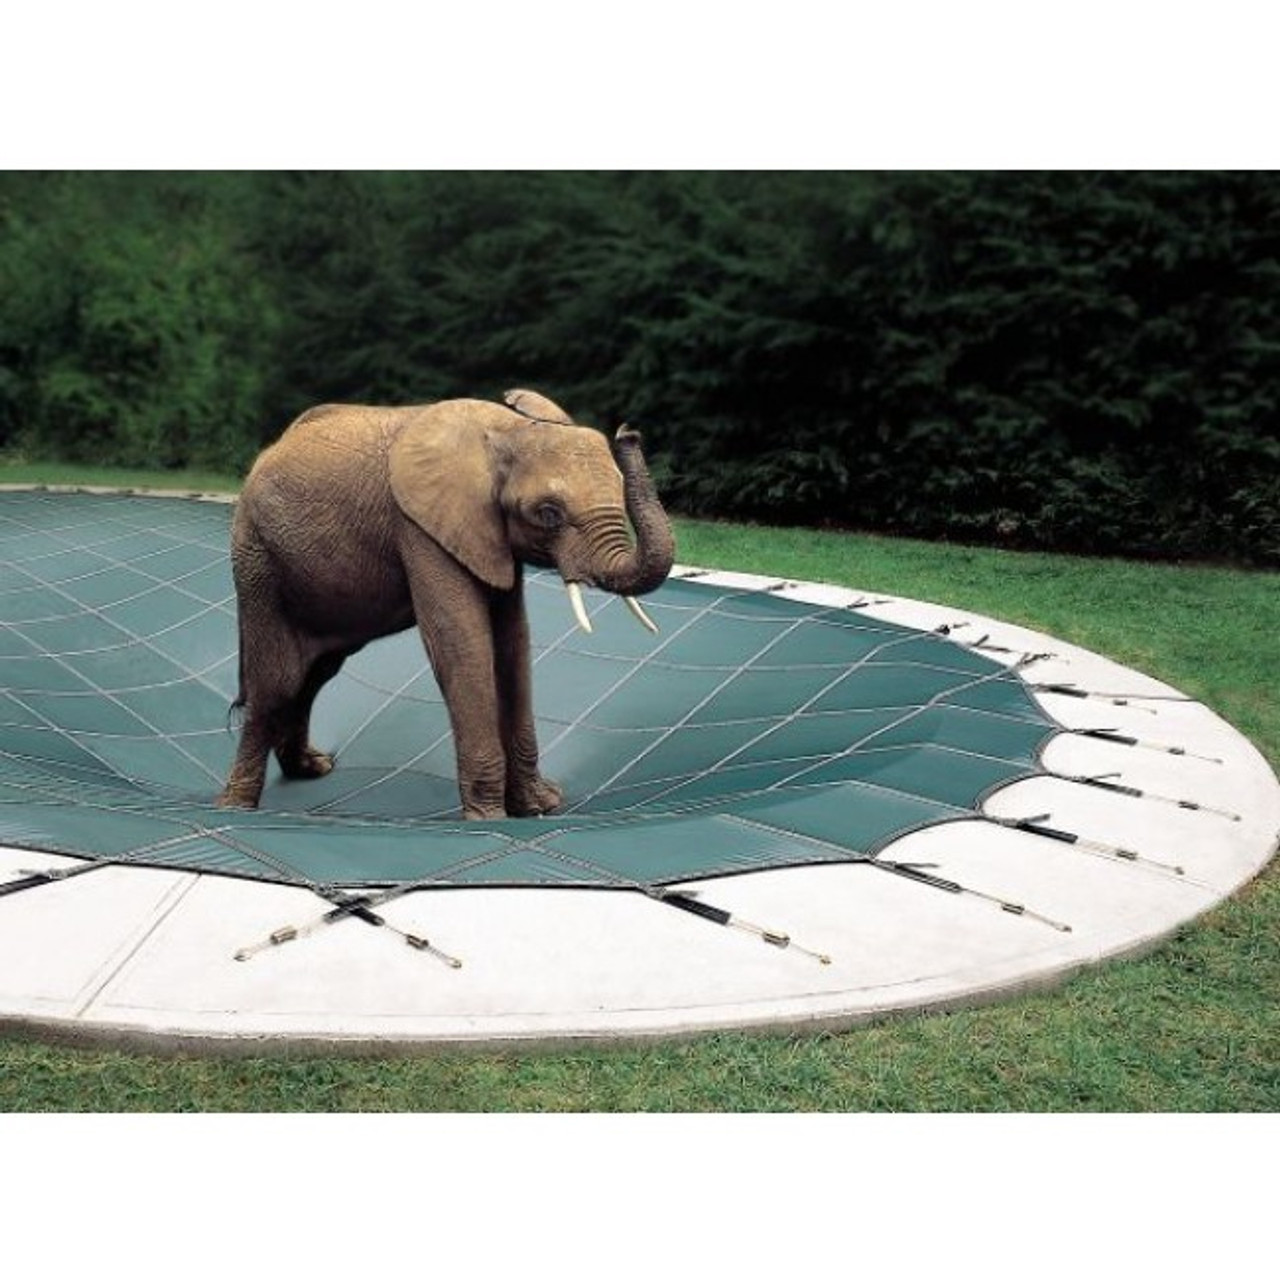 Loop-Loc Elephant on Pool Cover